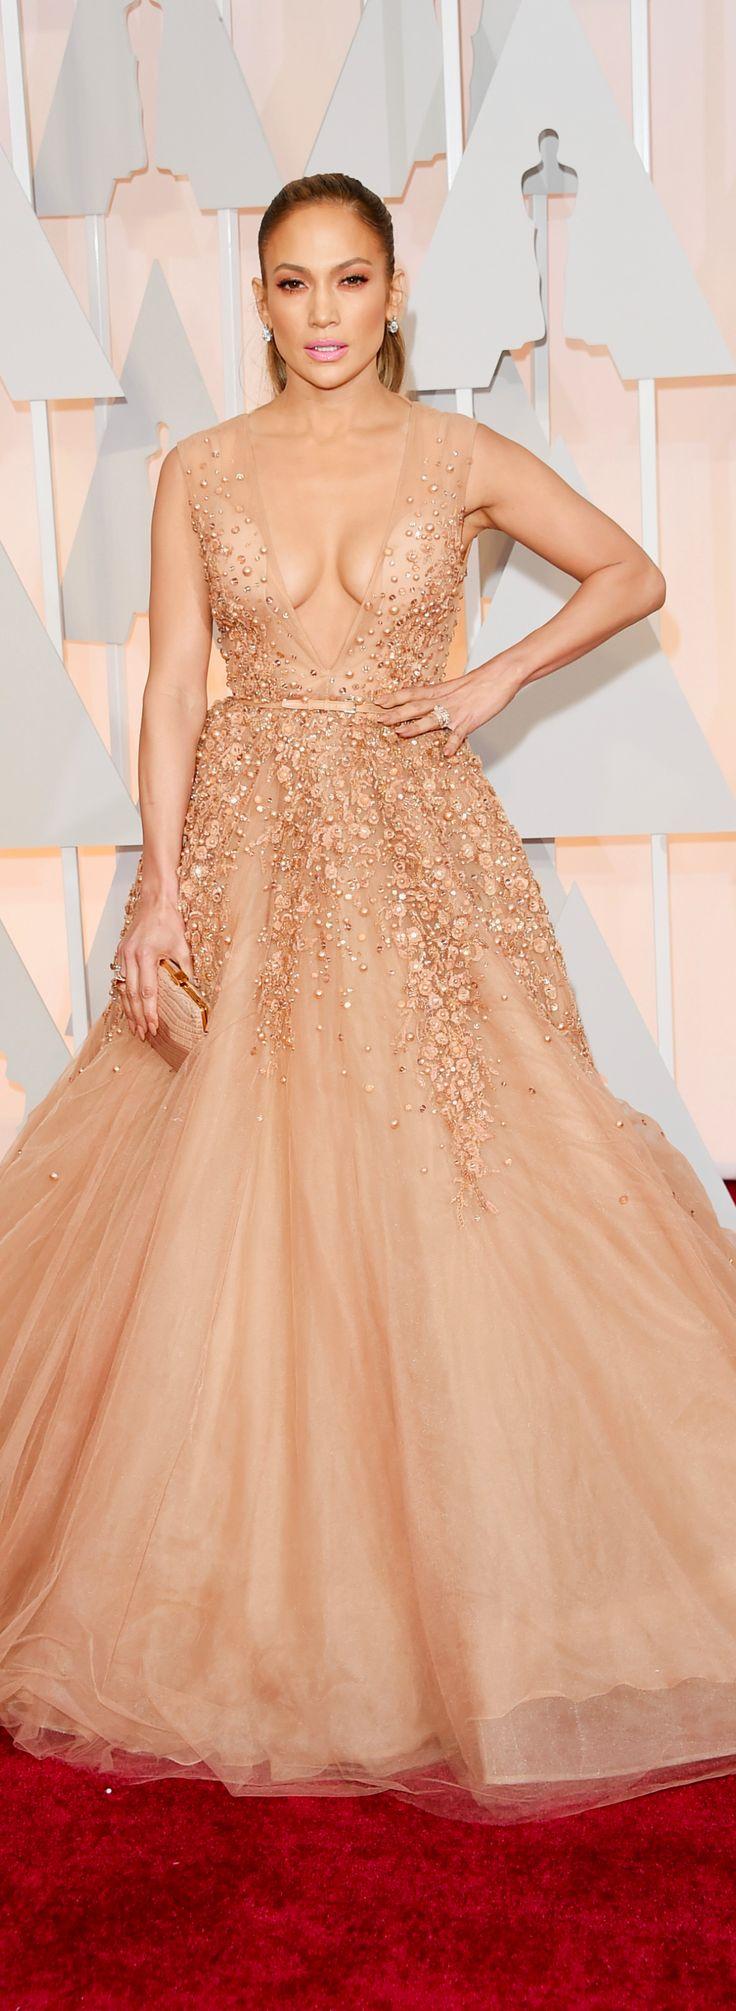 Jennifer Lopez in Elie Saab at the Oscars